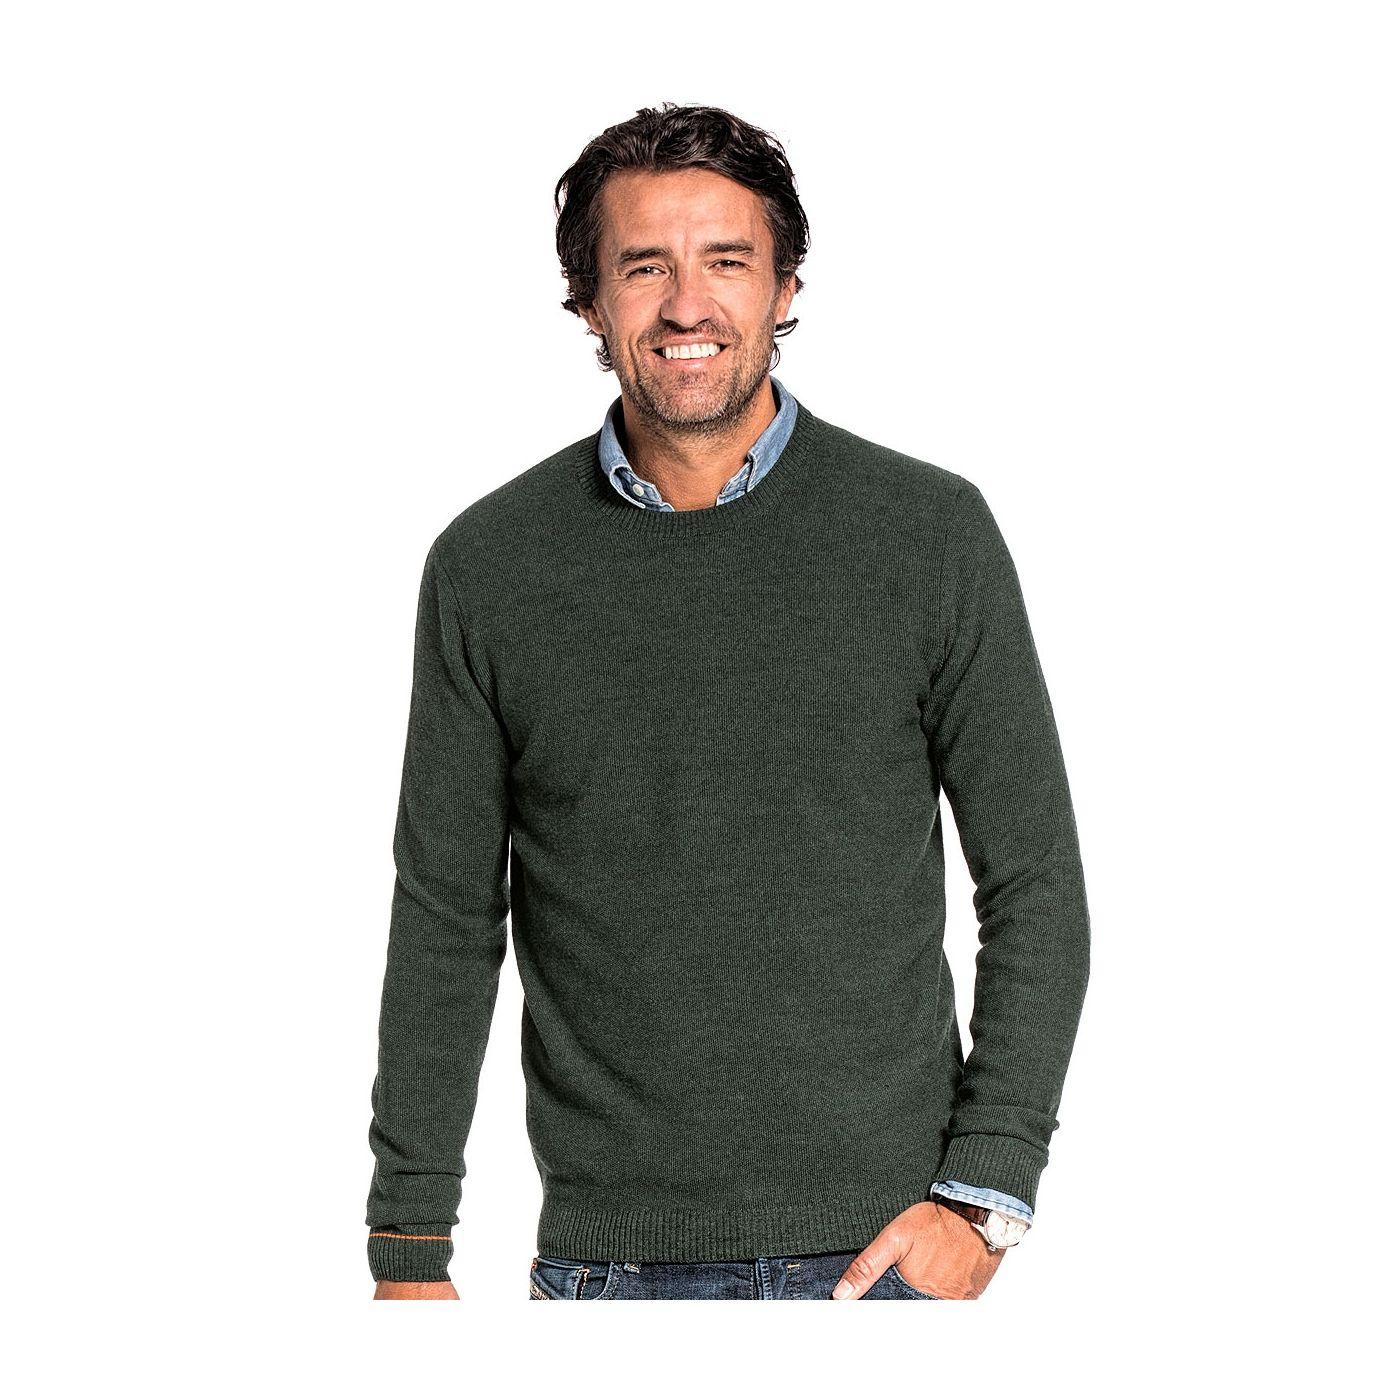 Honeycomb knit sweater for men made of Merino wool in Dark green